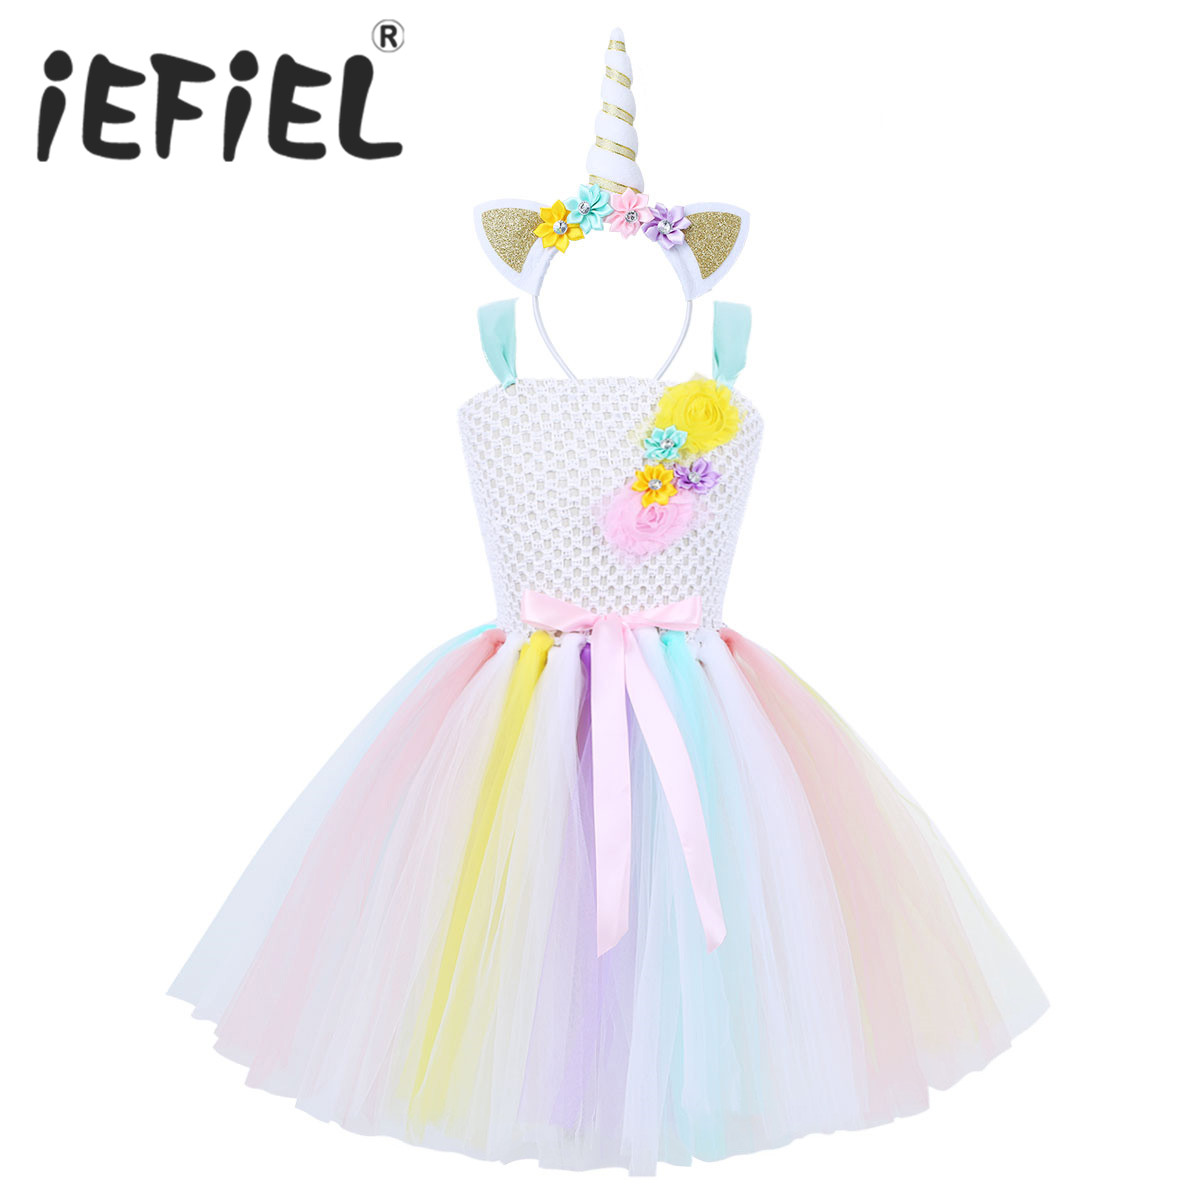 Girls Tutu Dress Fancy Rainbow Princess Party Tulle Dress With Headband Christmas Halloween Costume Kids Girl Dress Up Dress